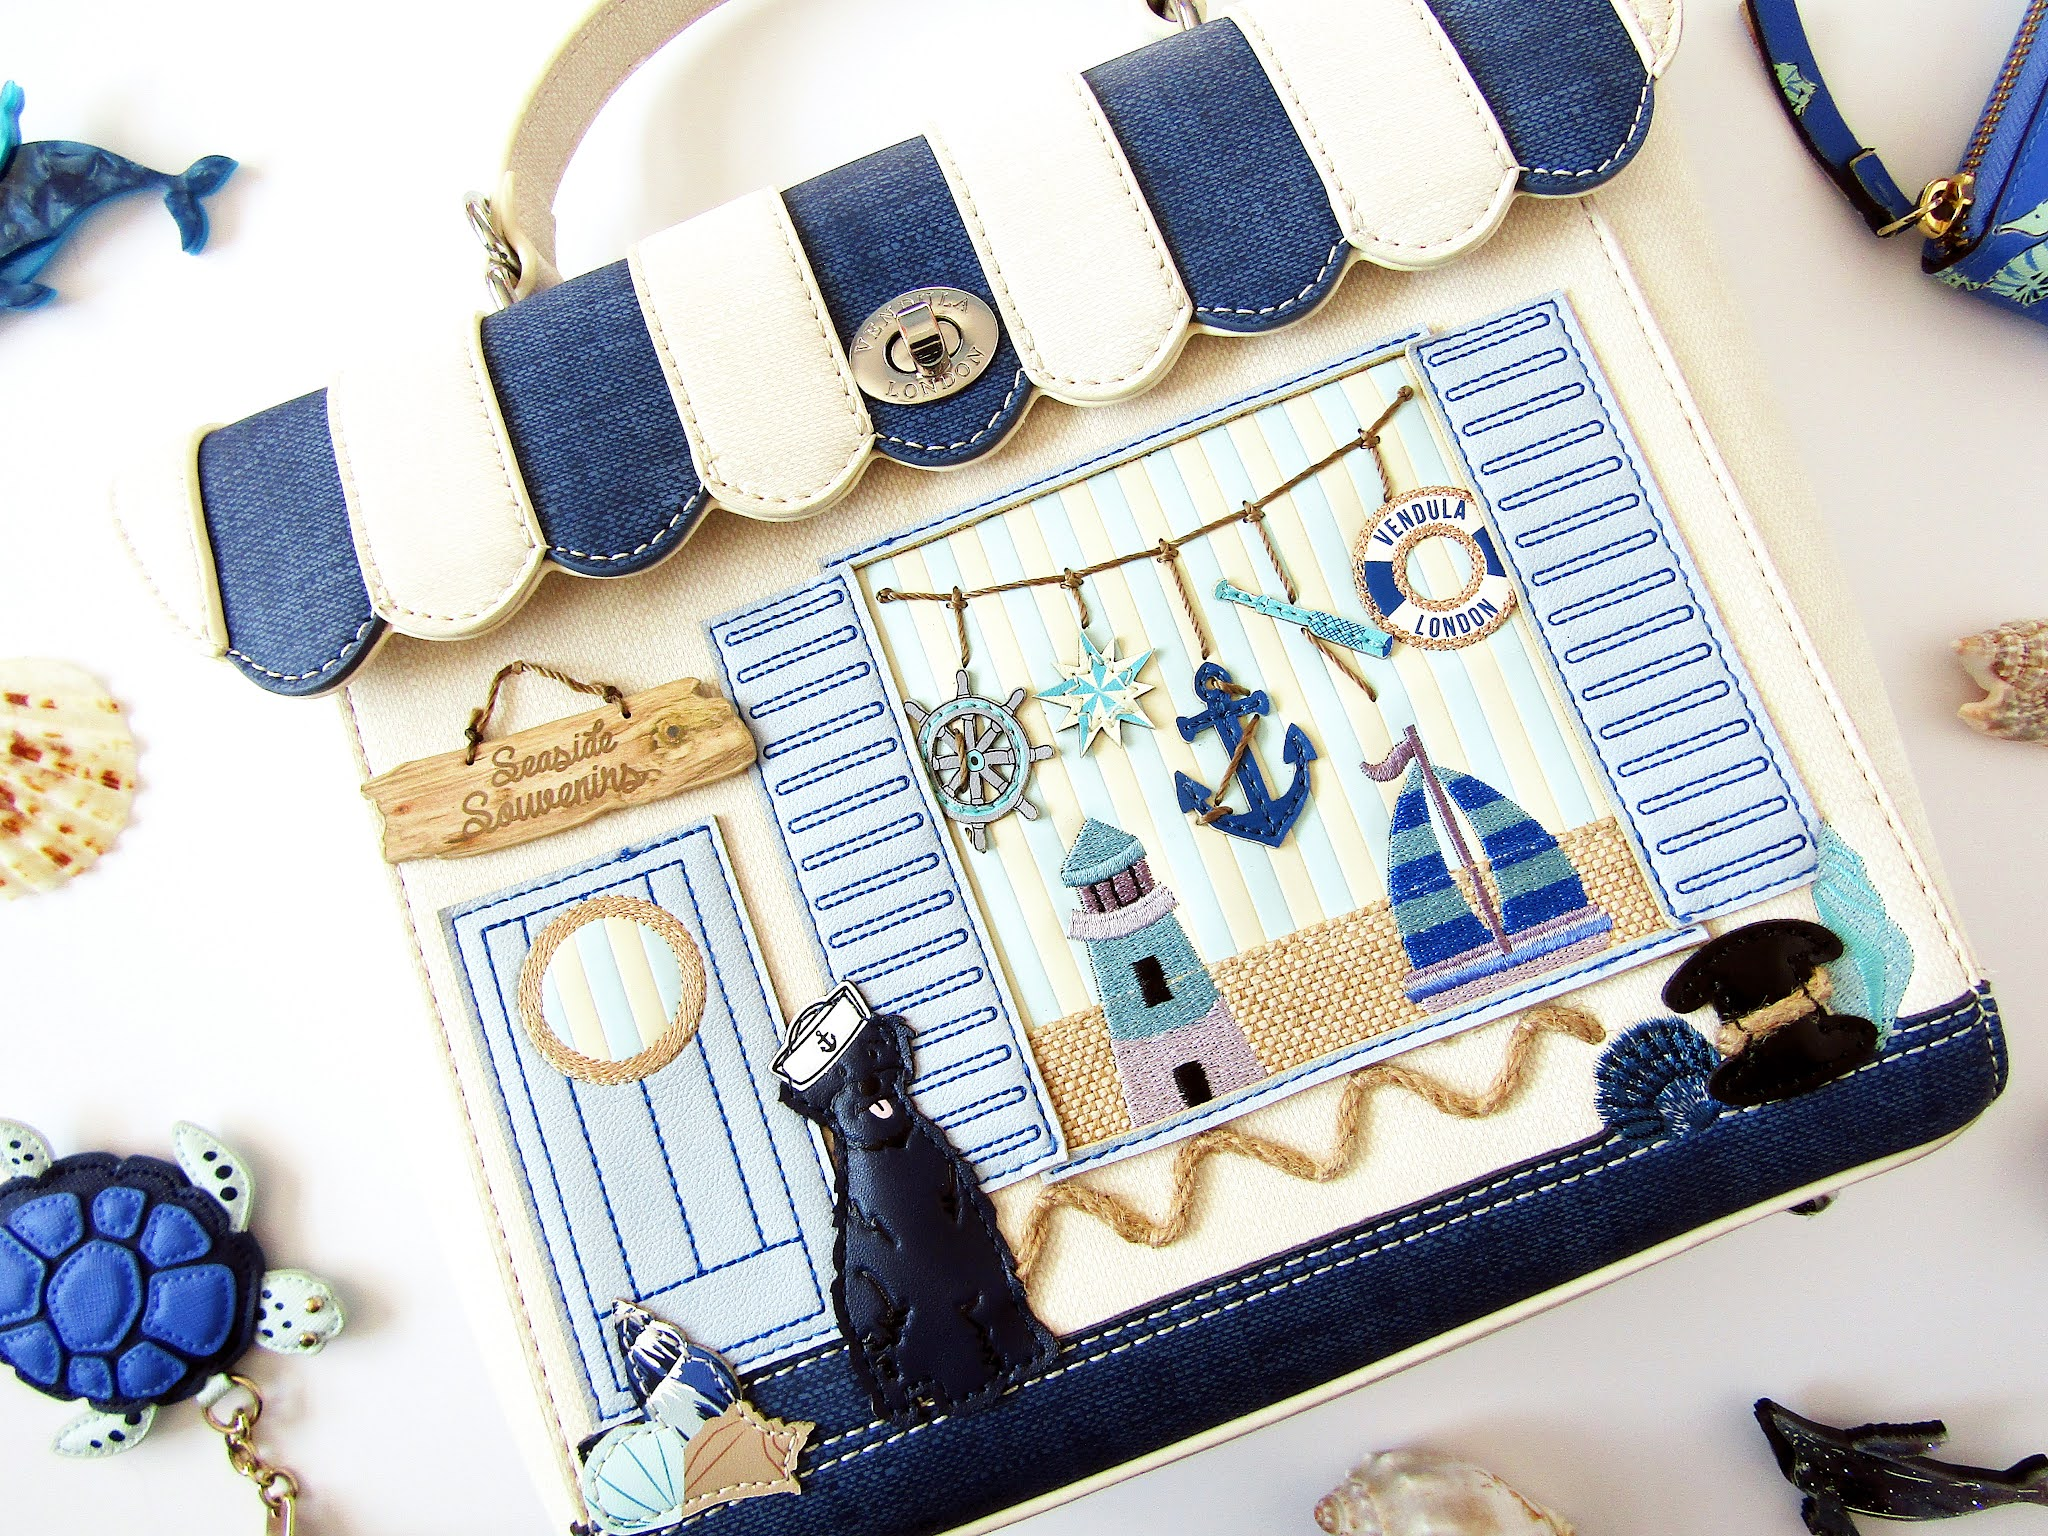 A photo of the Vendula London Seaside Souvenirs backpack.